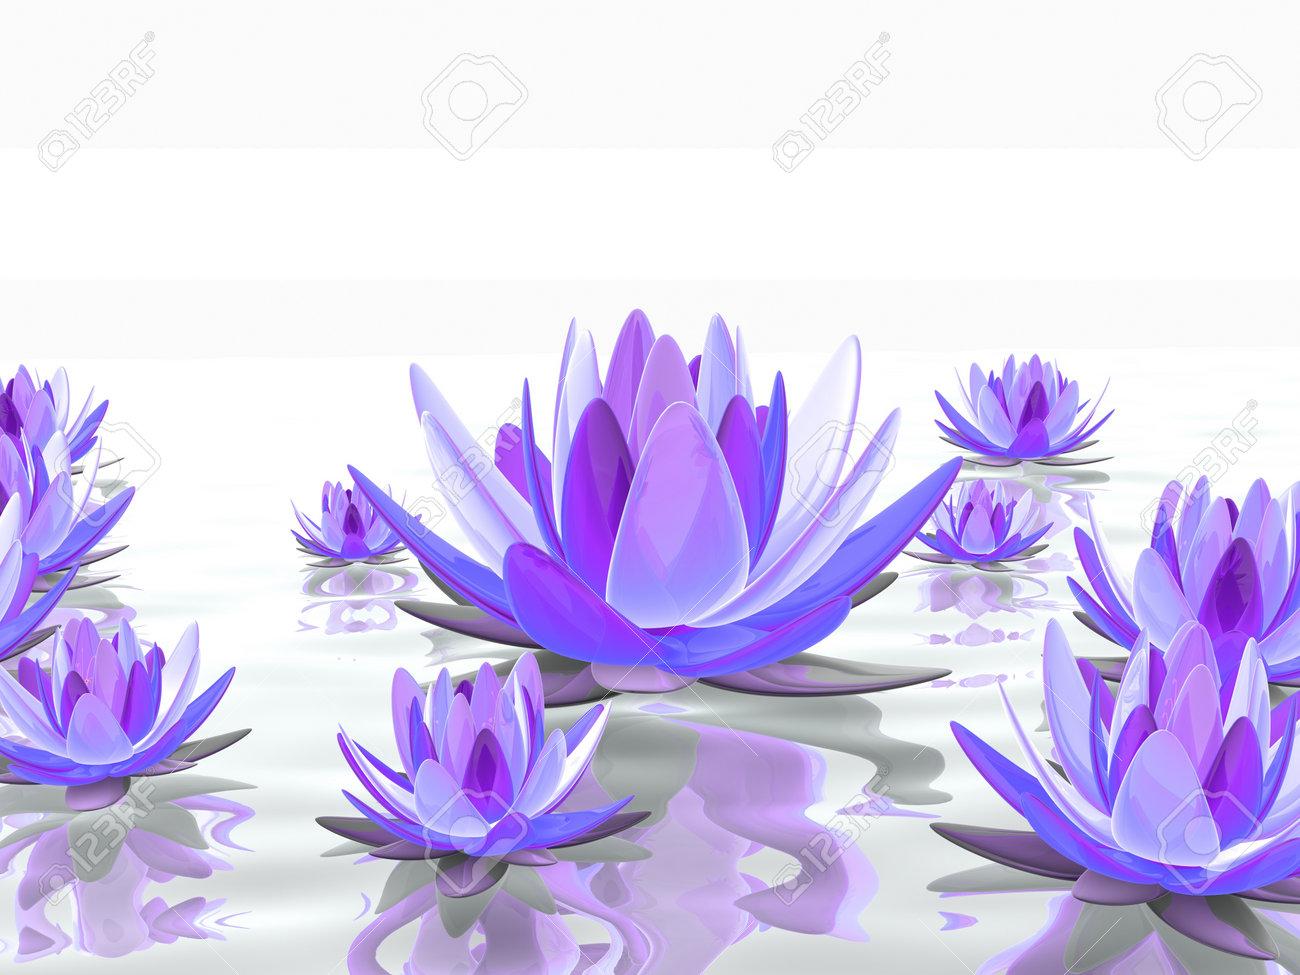 lotus flowers on water Stock Photo - 7165143